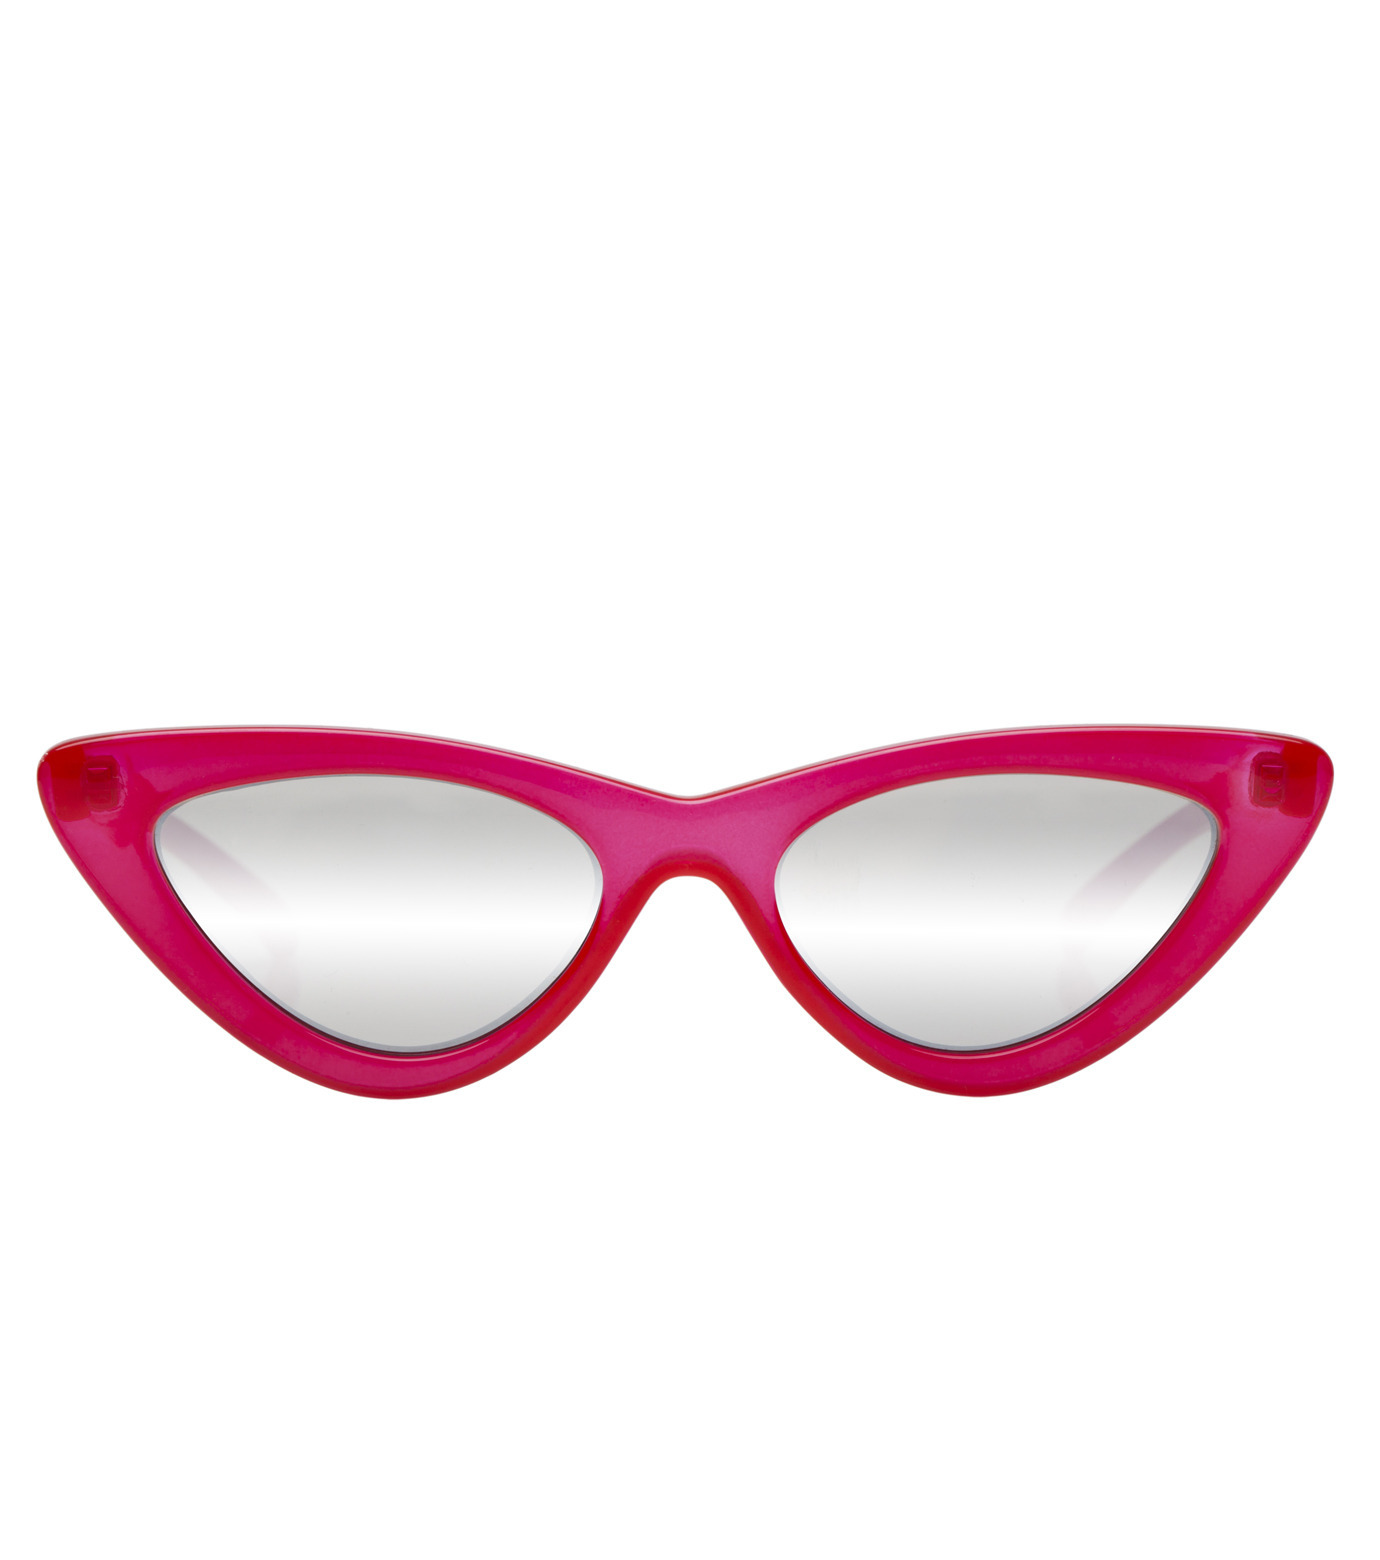 Adam Selman×Le Specs(アダム・セルマン×ル・スペックス)のThe Last Lotita -Opaque Red / Silver Mirror--RED(アイウェア/eyewear)-1502112-62 拡大詳細画像2